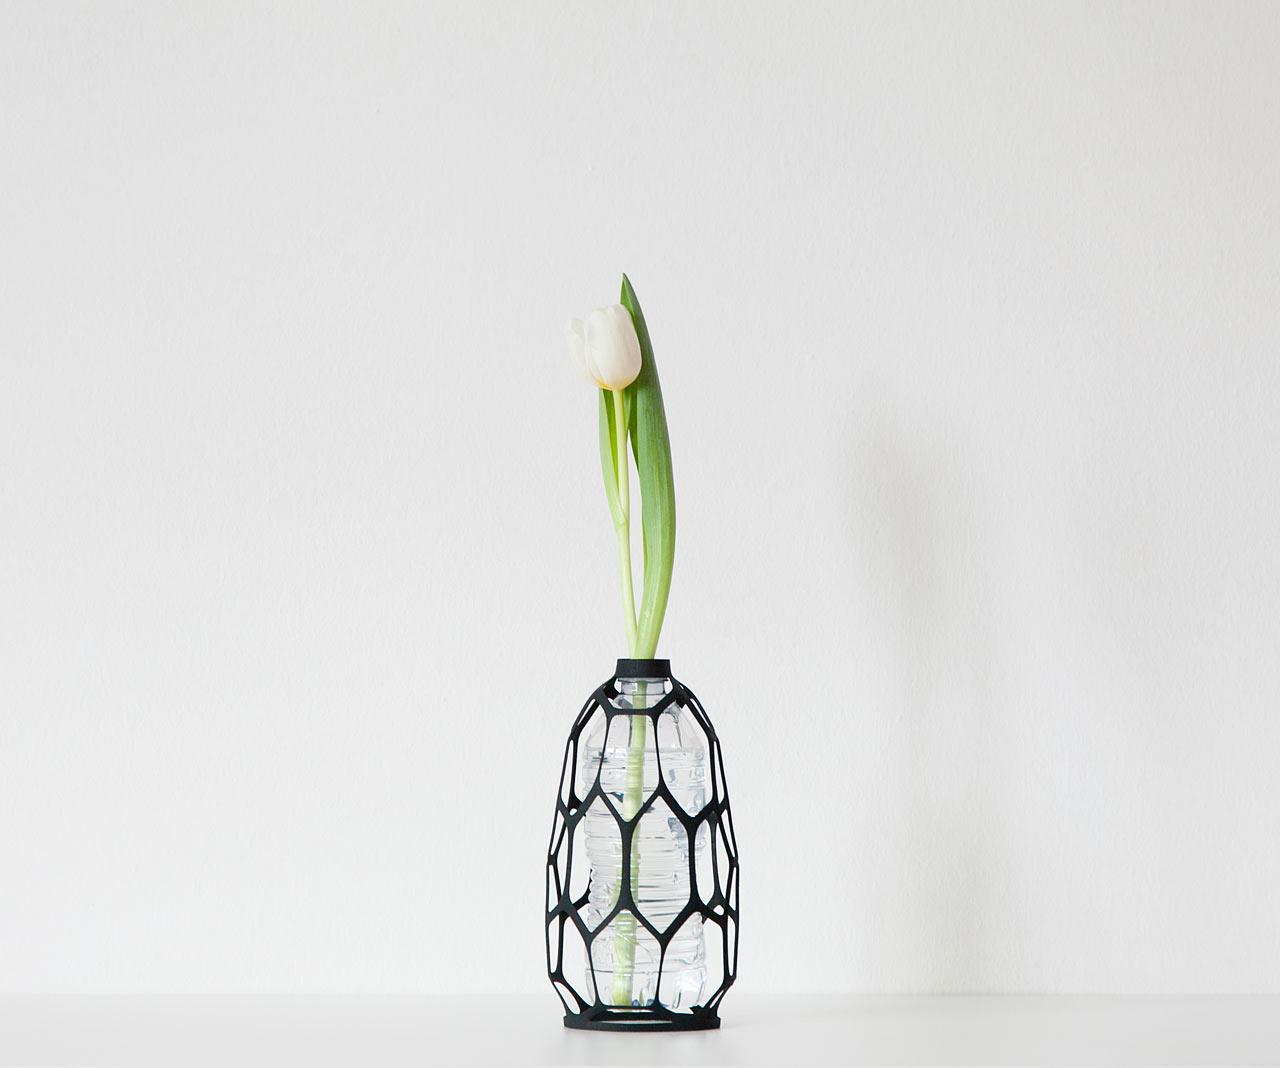 Libero Rutilo, 3D printed vases, PET bottles